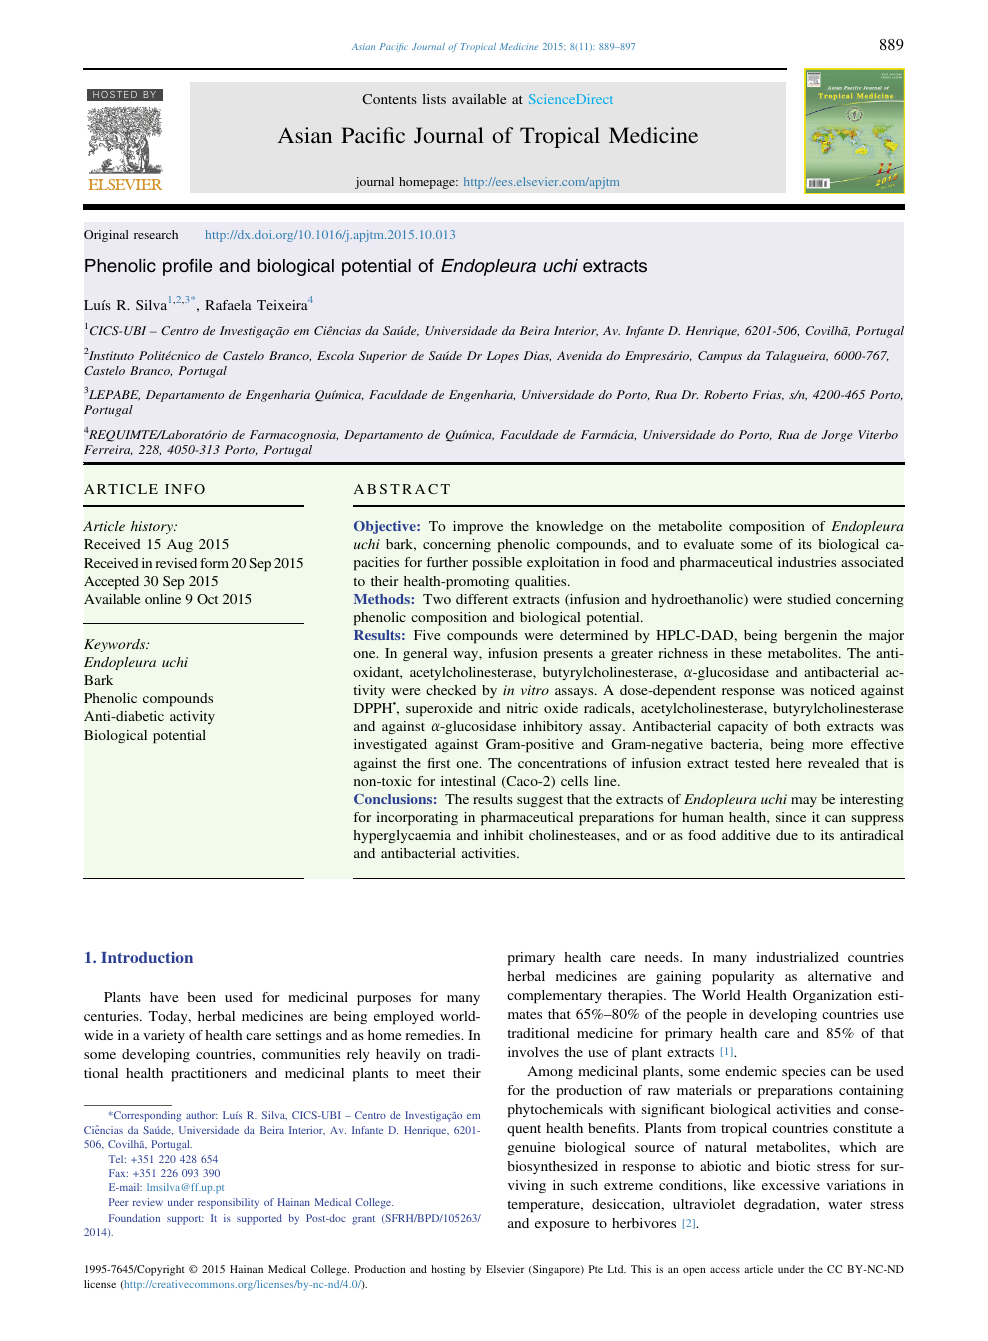 Phenolic profile and biological potential of Endopleura uchi